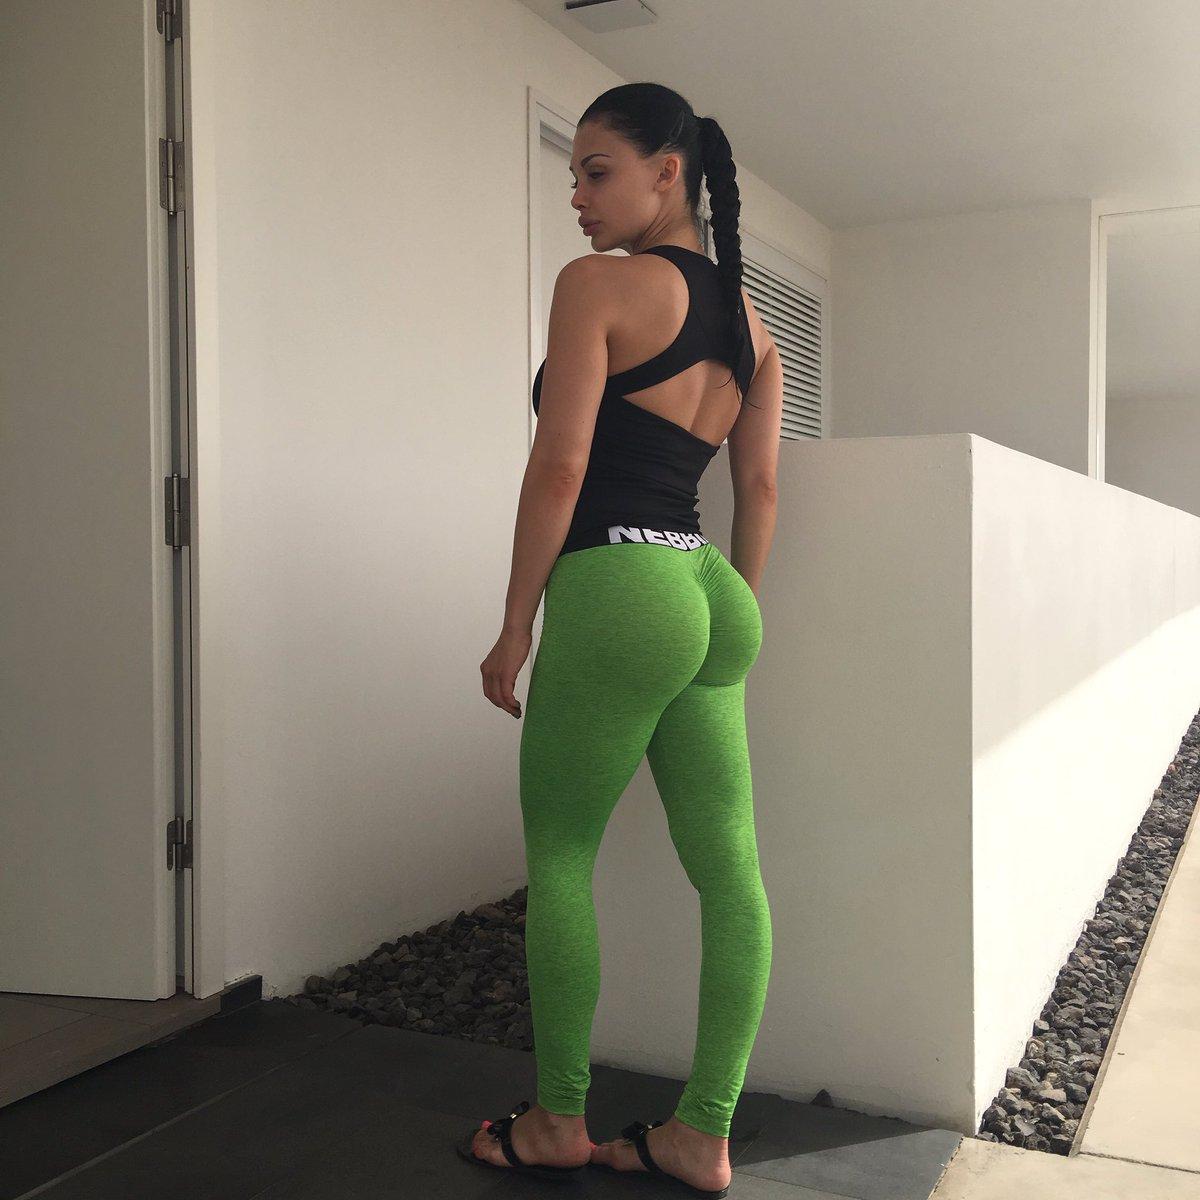 yogapants #ass #gym - Twitter Search